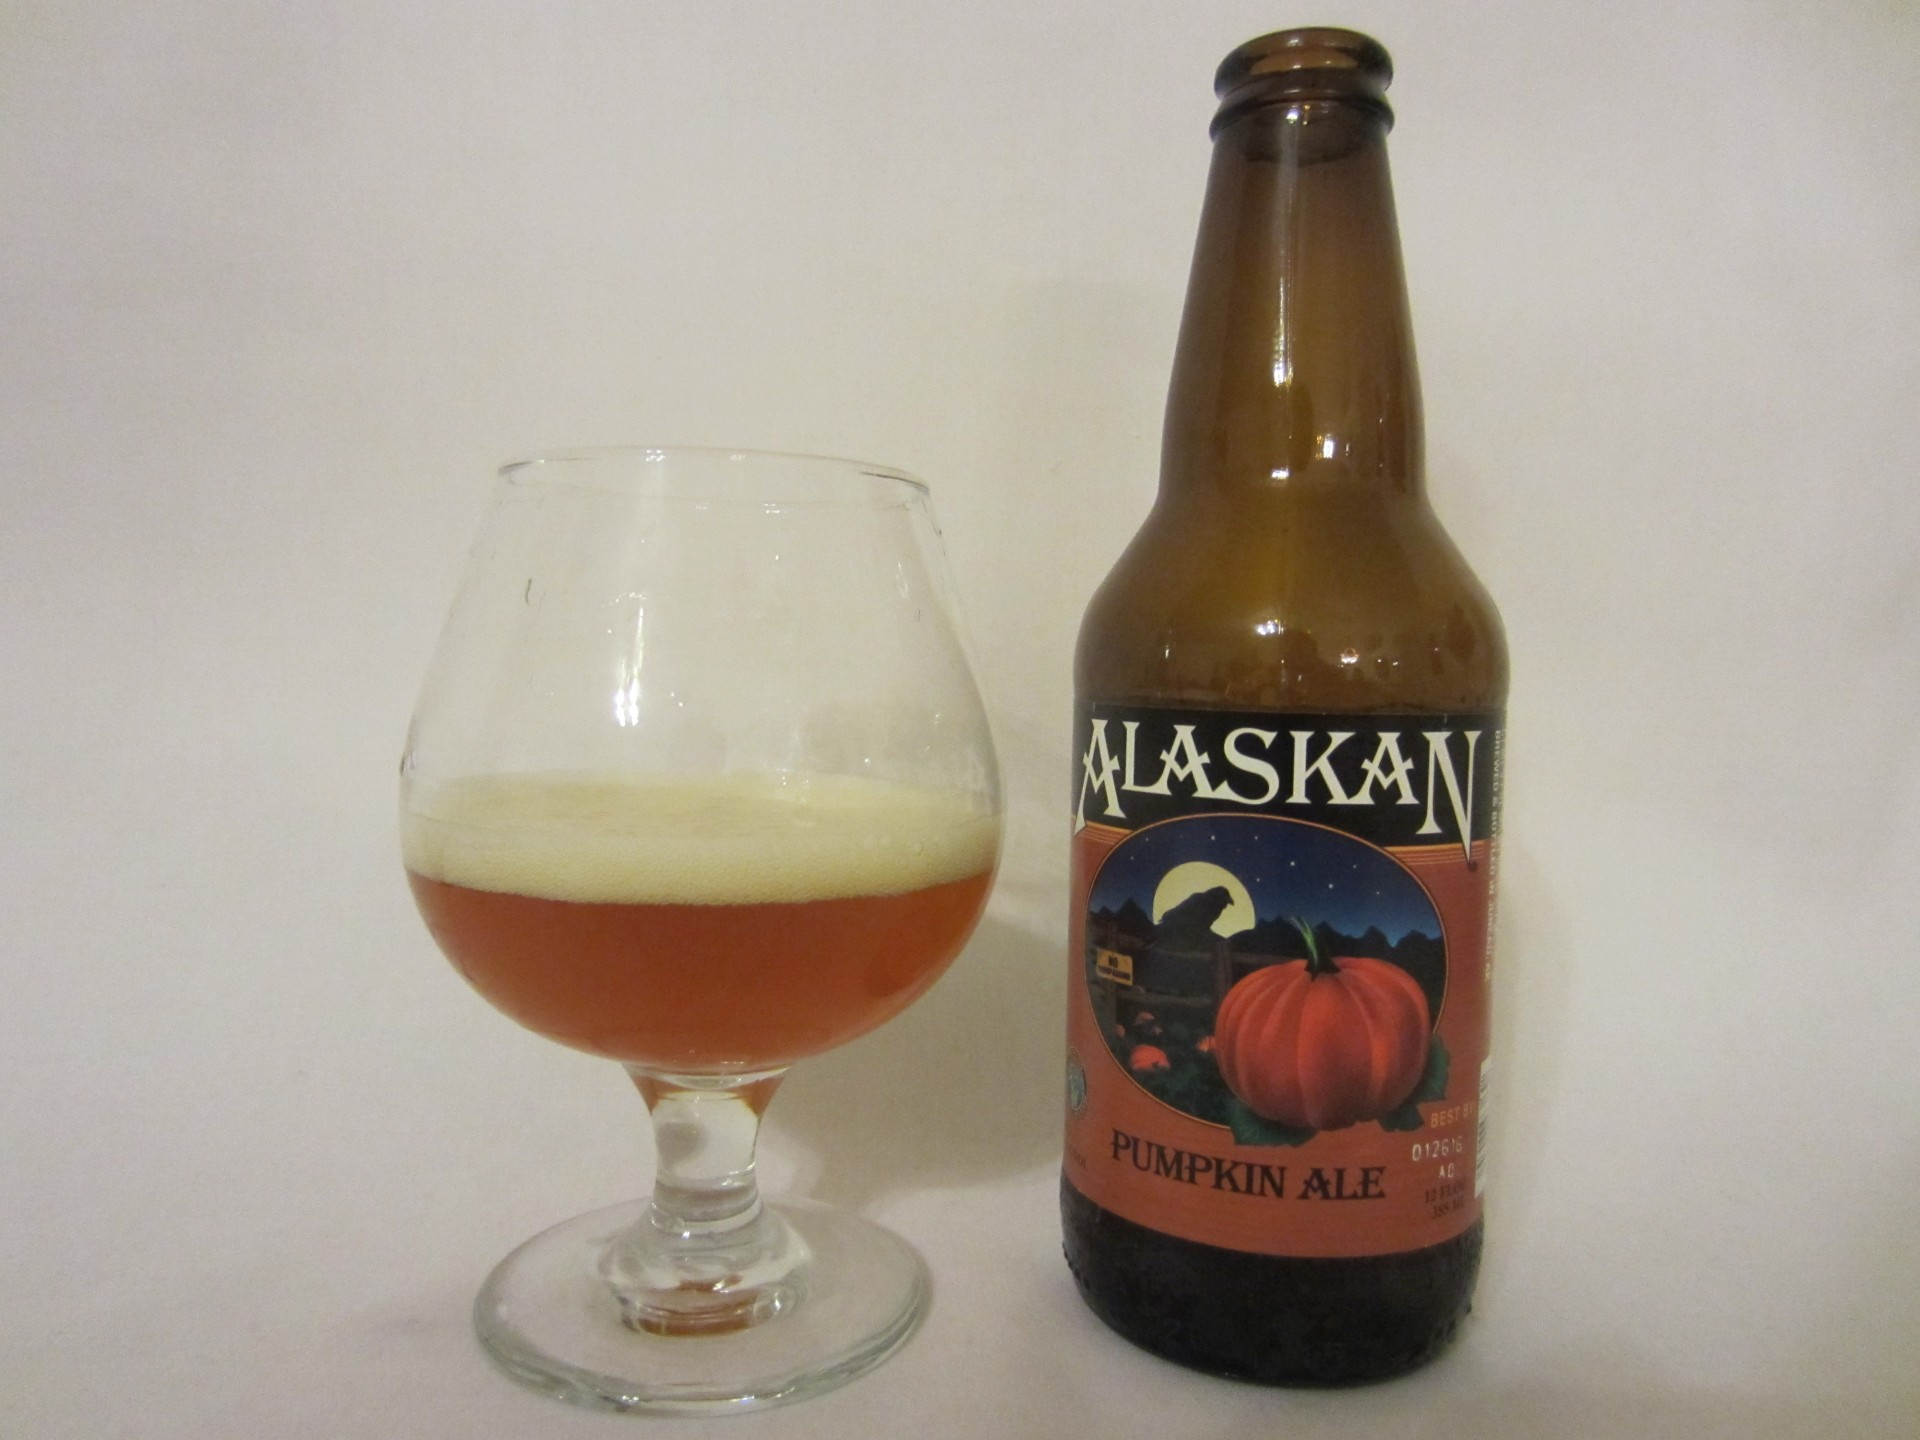 Alaskan Pumpkin Ale (2015) - Alaskan Brewing Co.